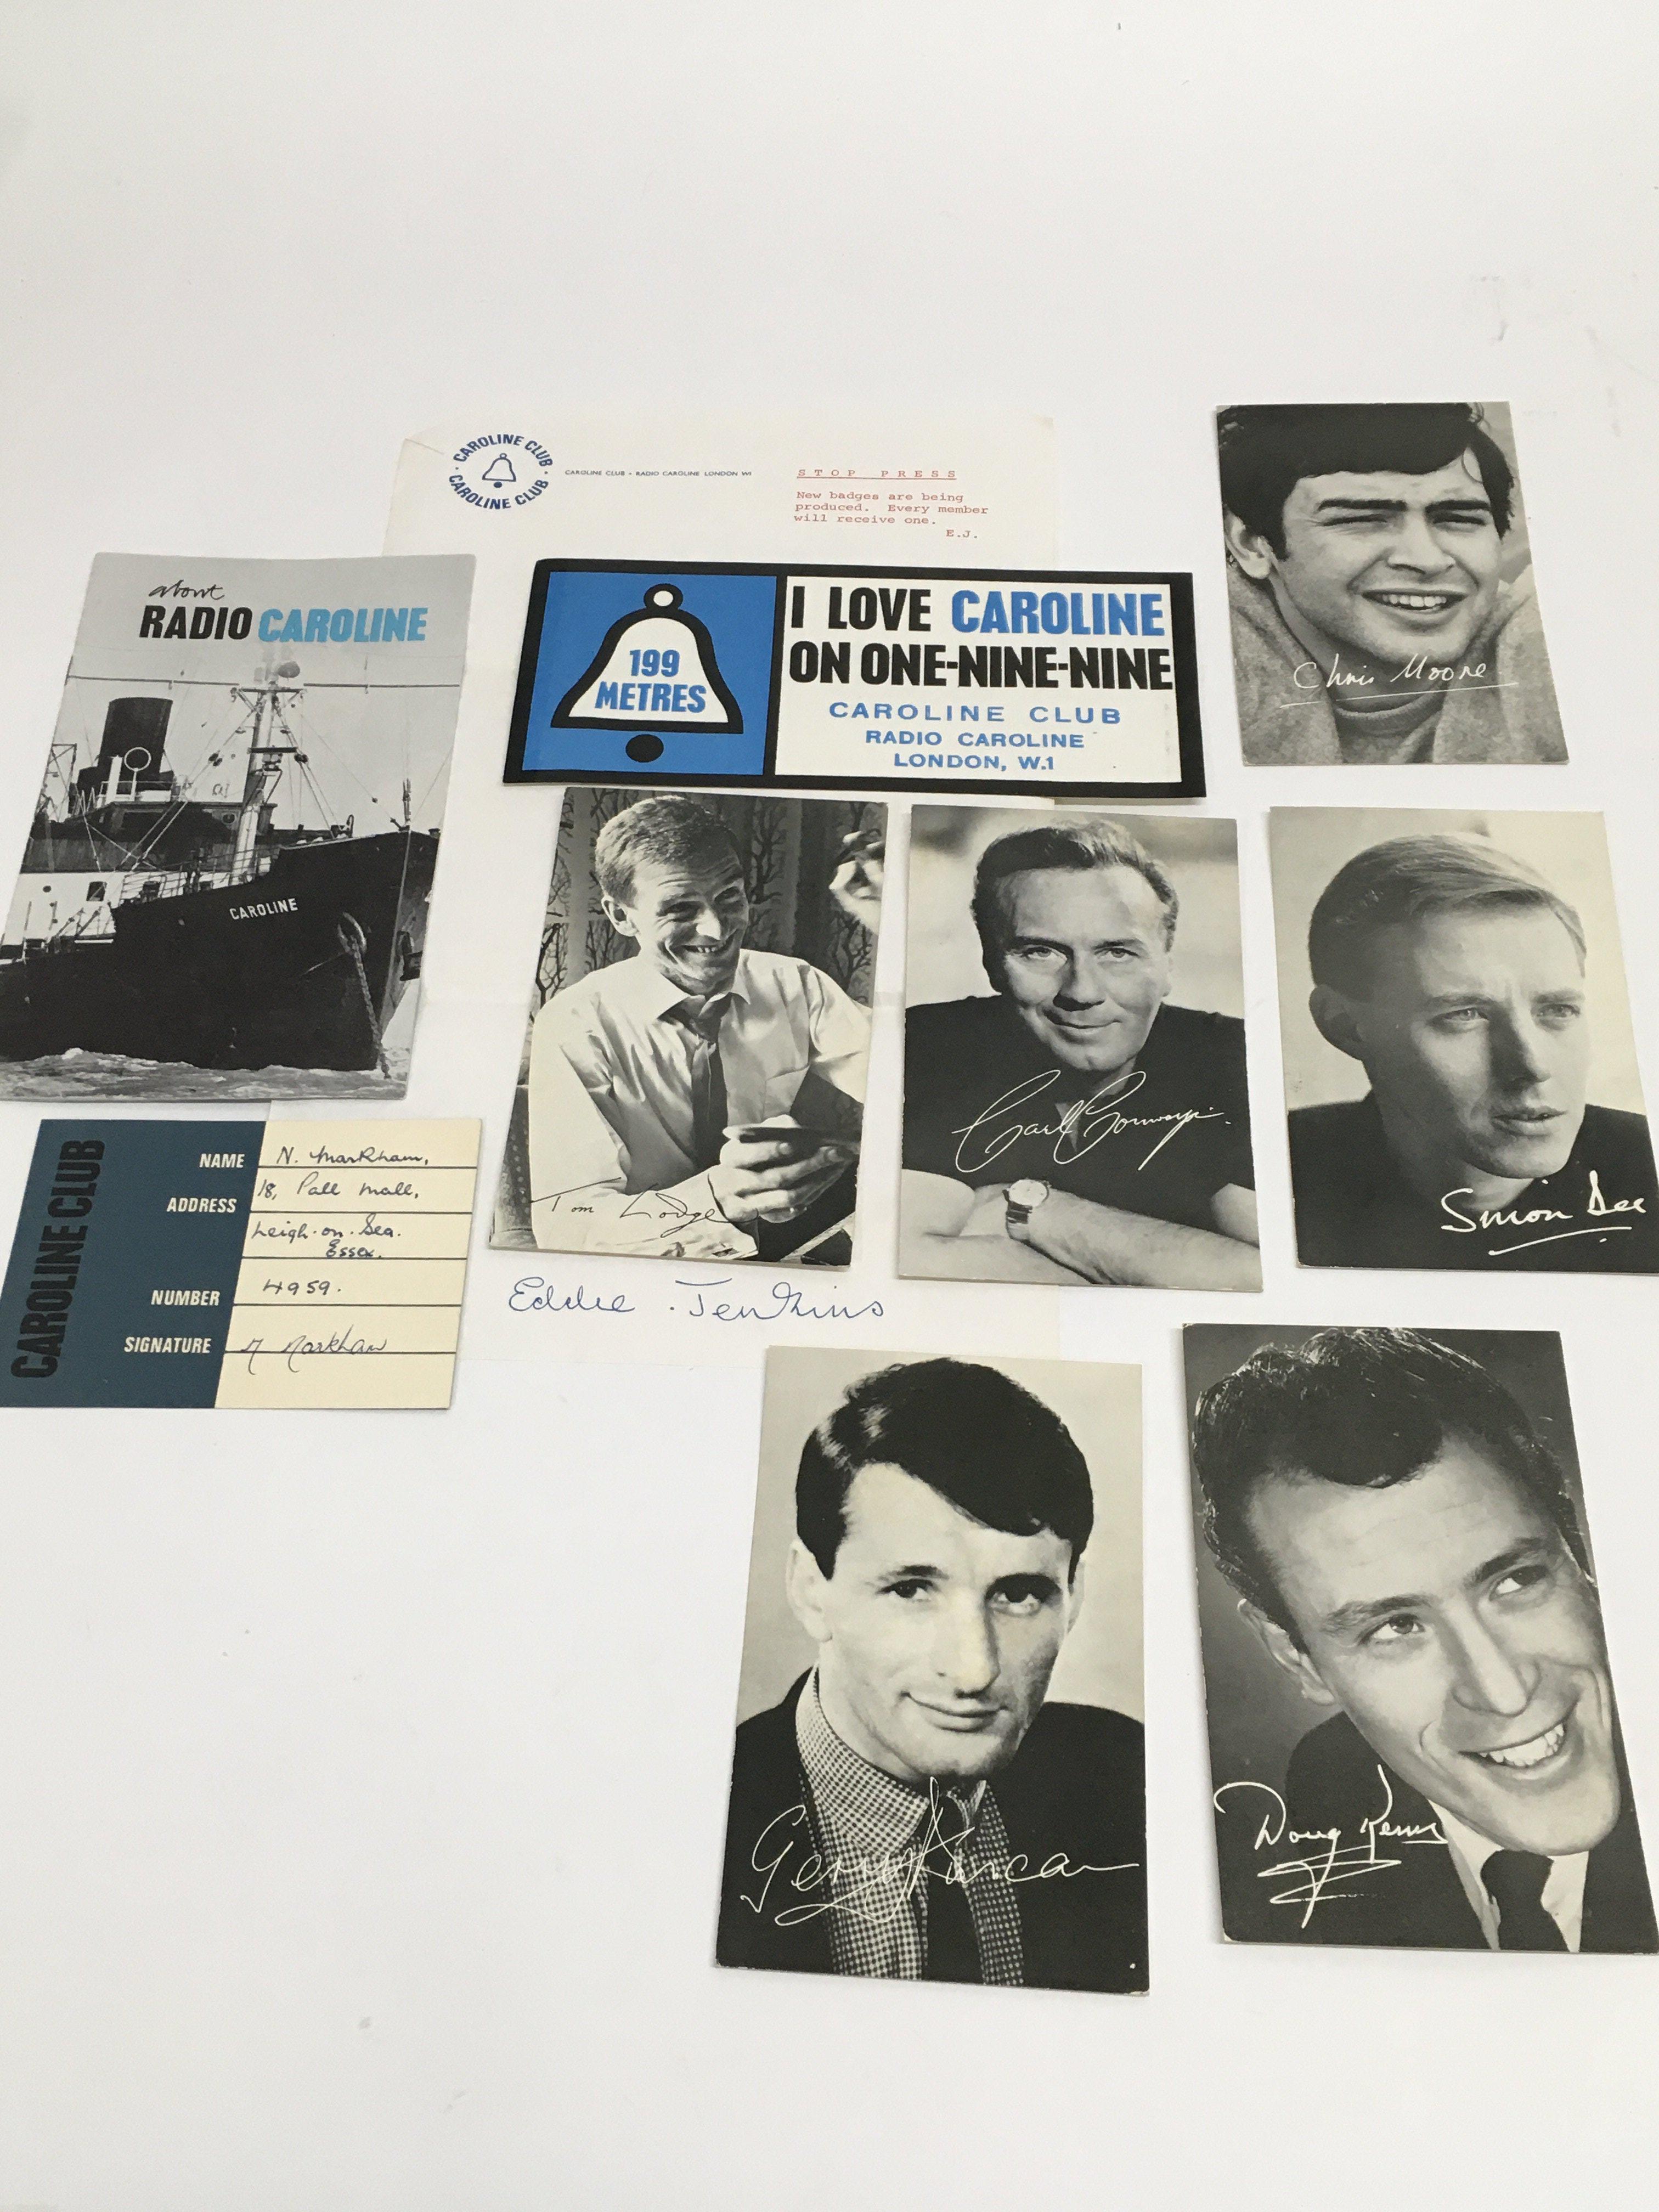 A small collection of Radio Caroline ephemera.